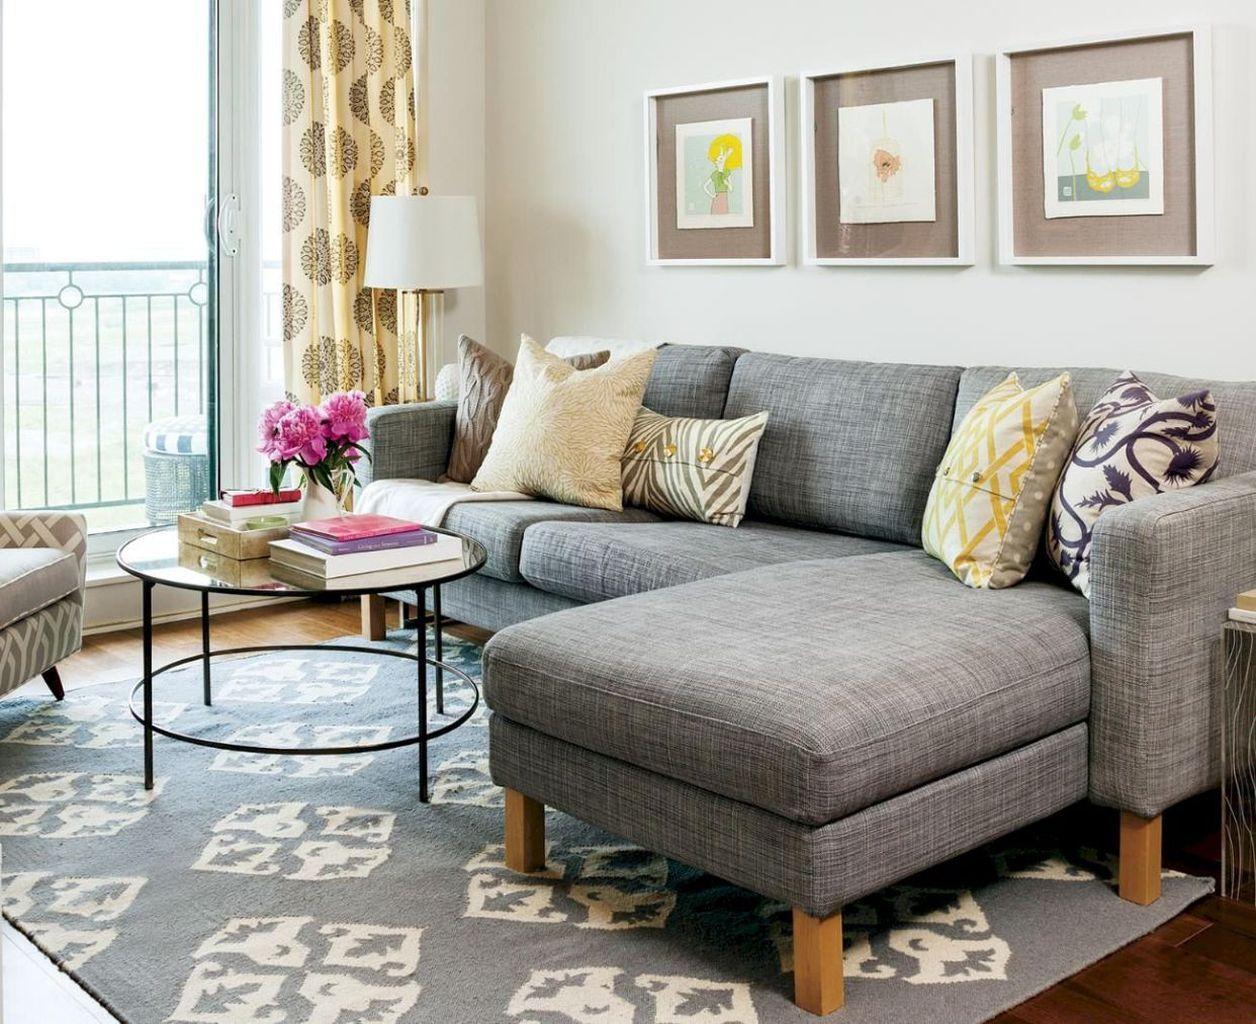 Cozy condo living rooms  cozy studio apartment decoration ideas on a budget  cozy studio